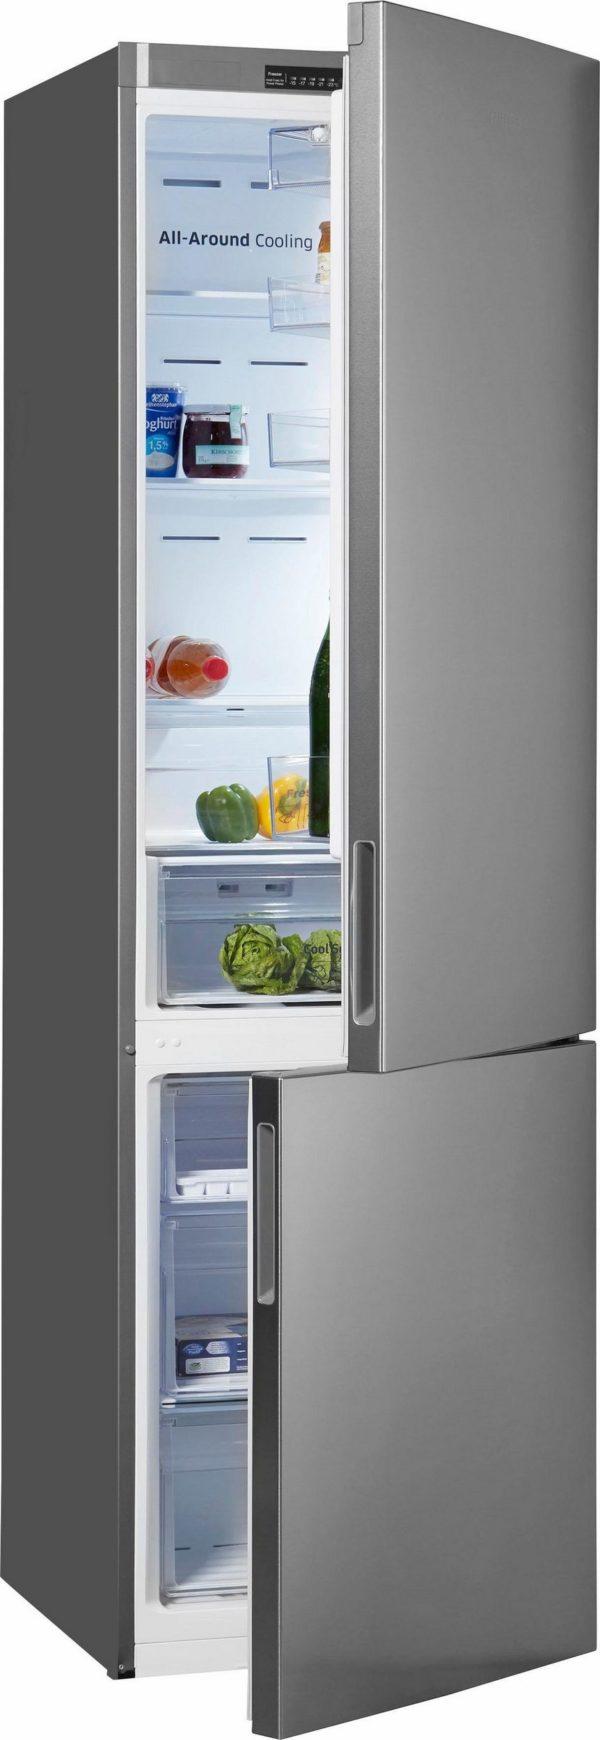 Хладилник SAMSUNG RL37J500MSLEG, A+++, NoFrost